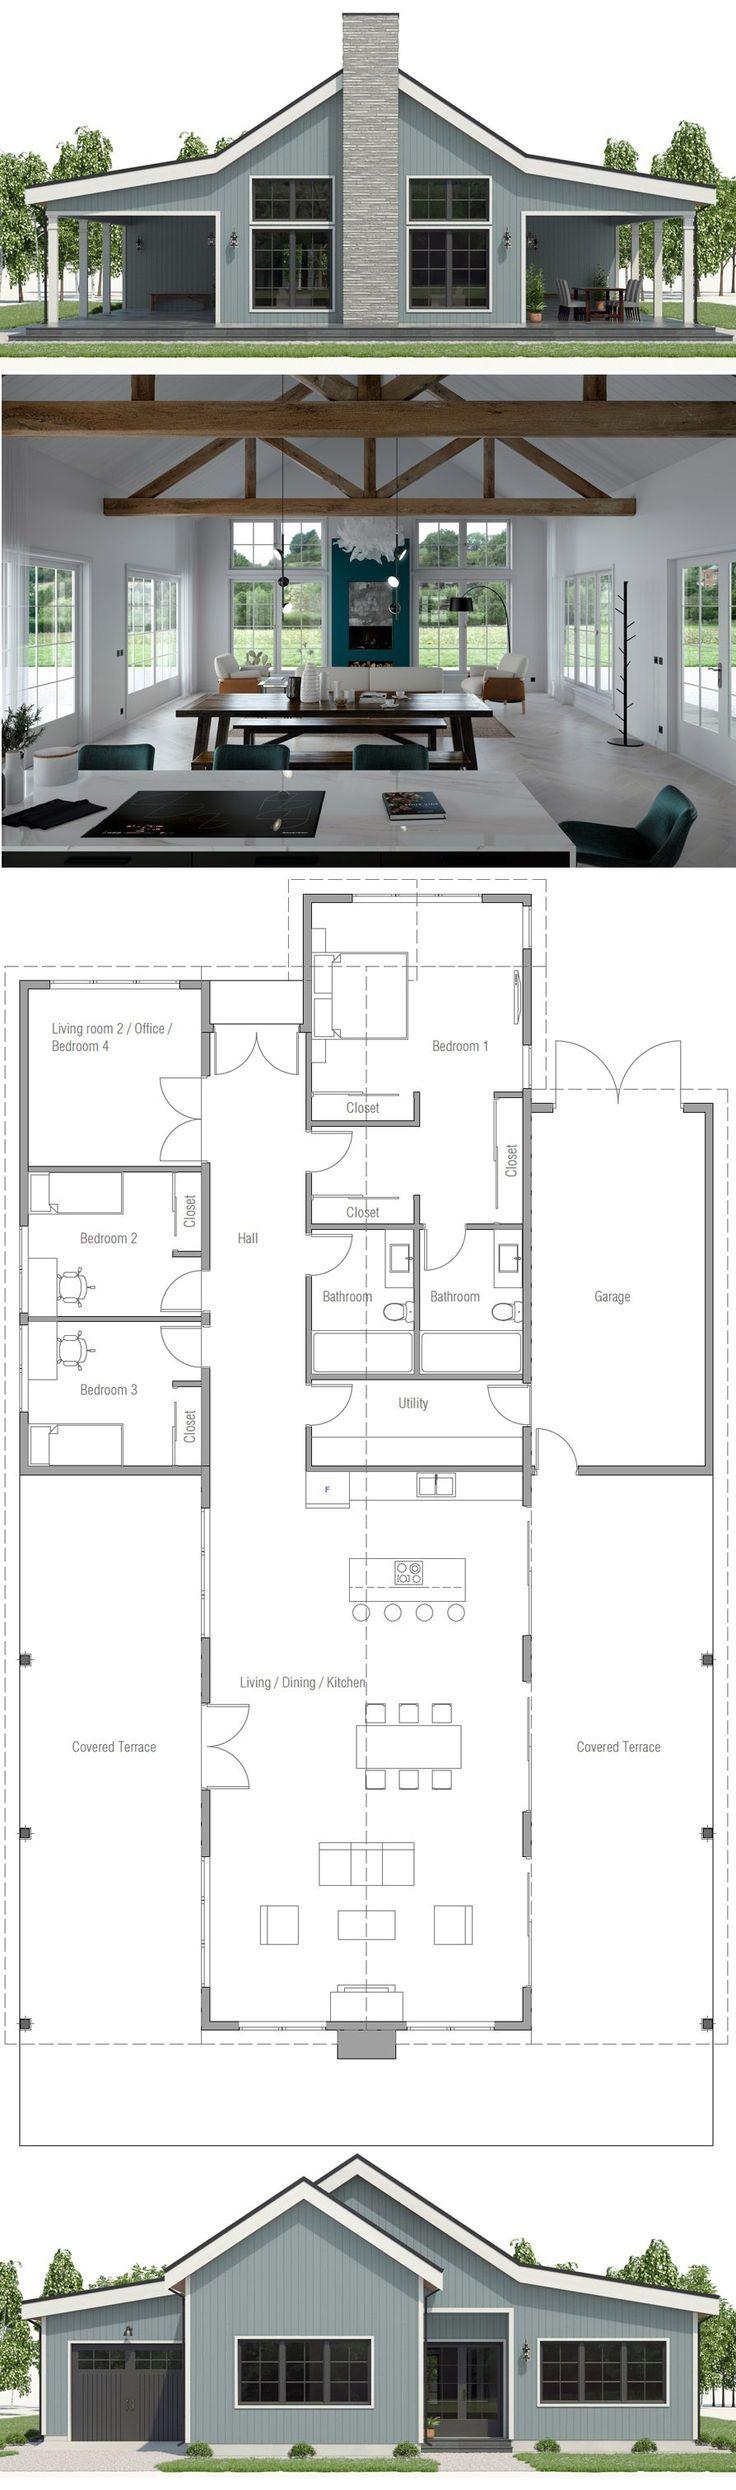 Home Plan, House Plan, Floor Plan, #architecture #…